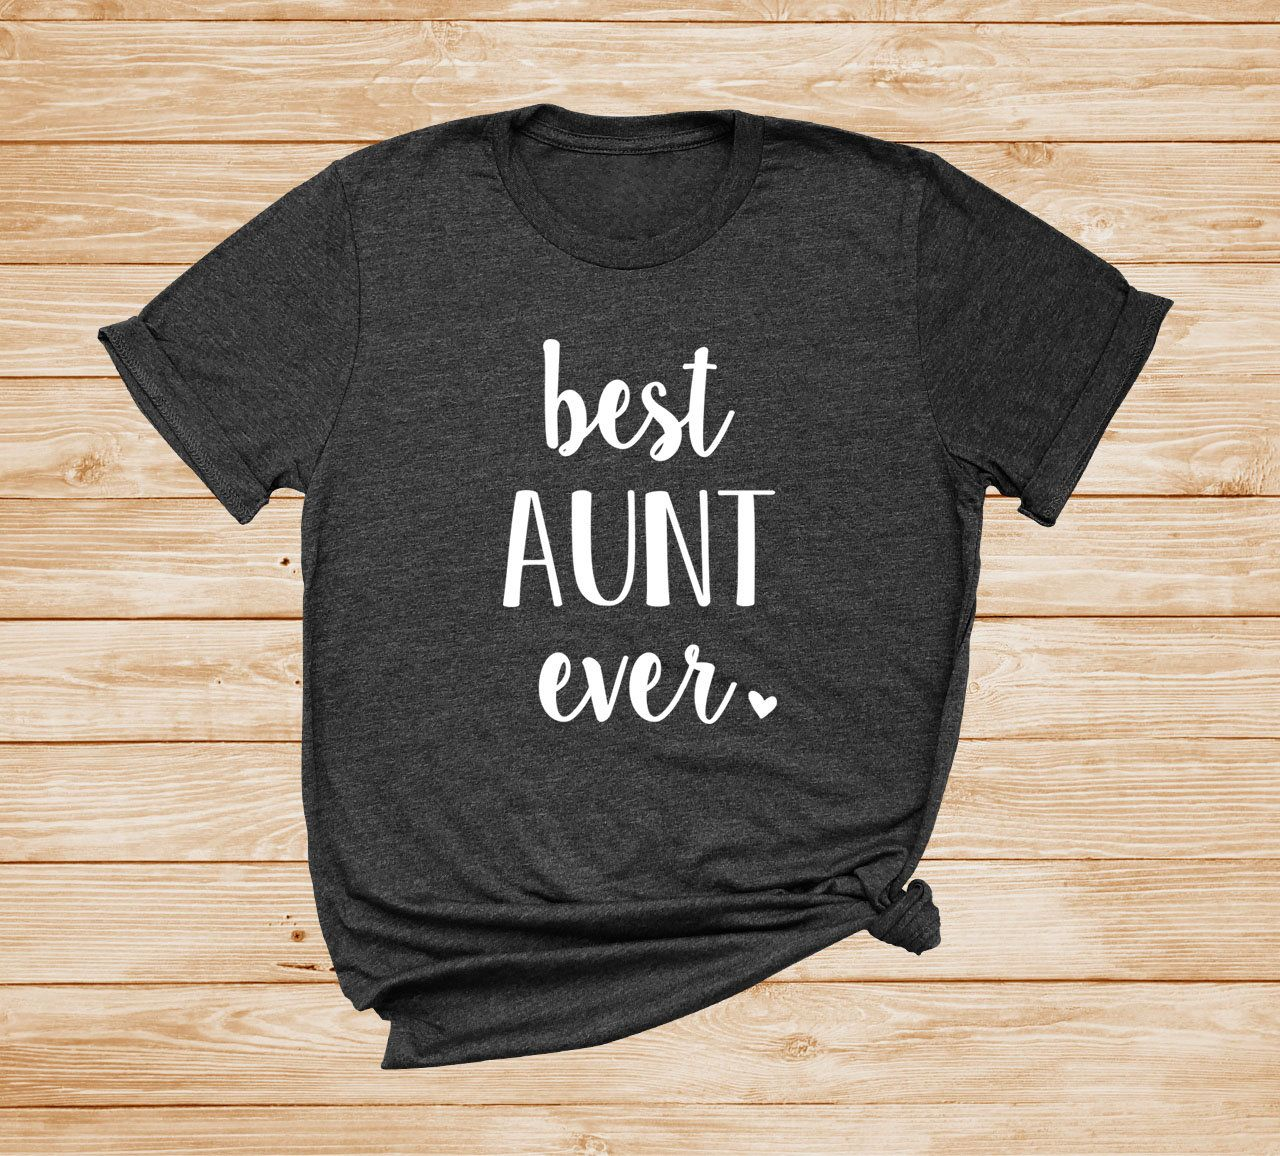 Best aunt ever unisex tshirt aunt shirt gift for aunt